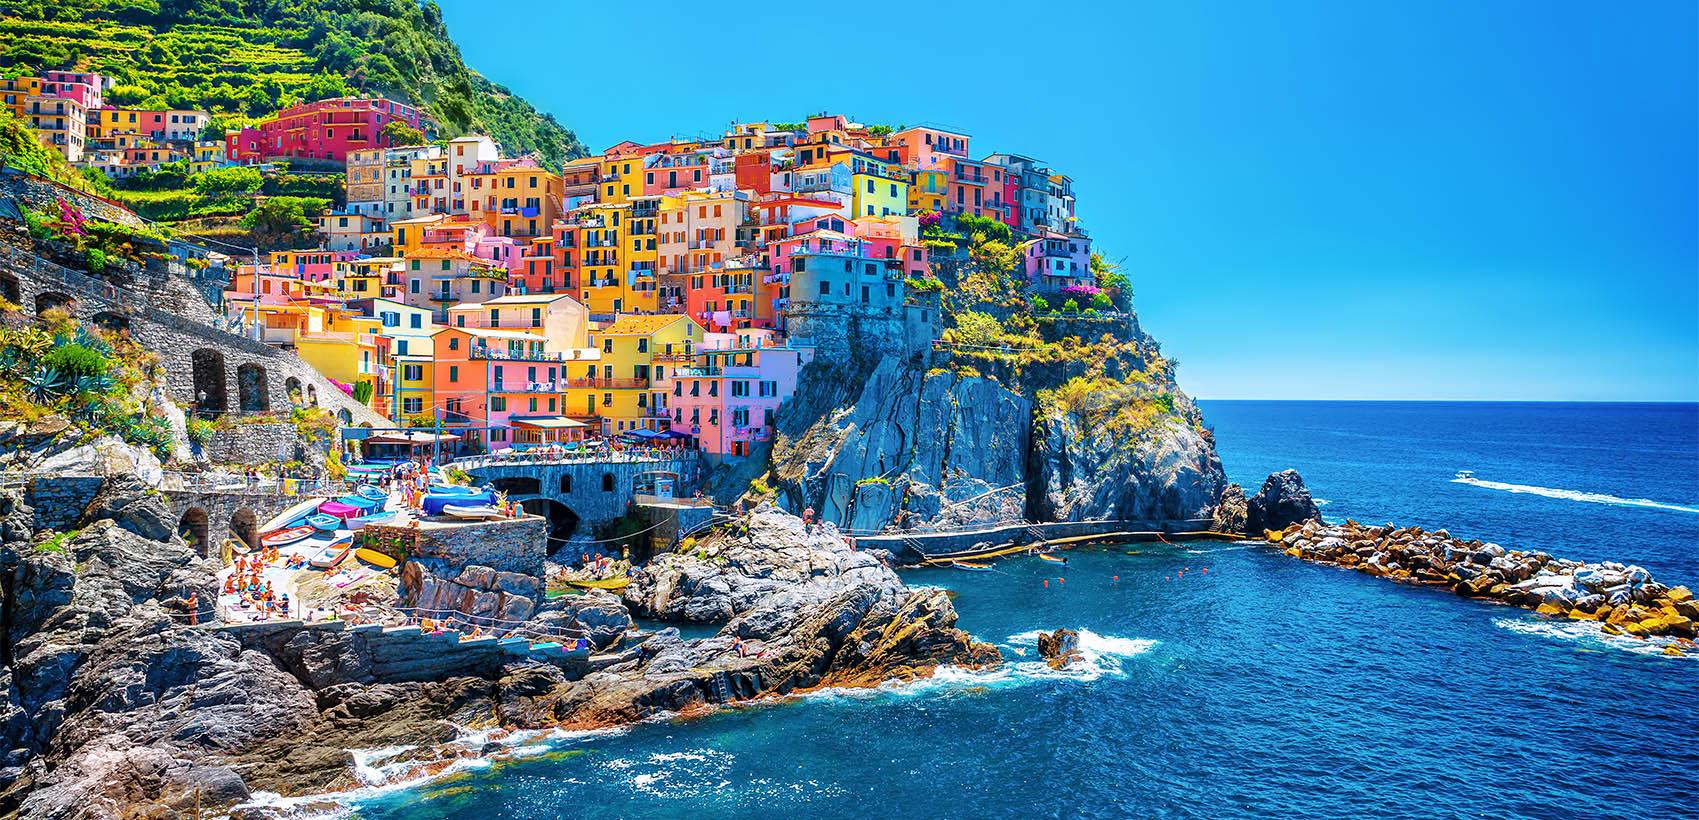 Tuscany & Cinque Terre 2